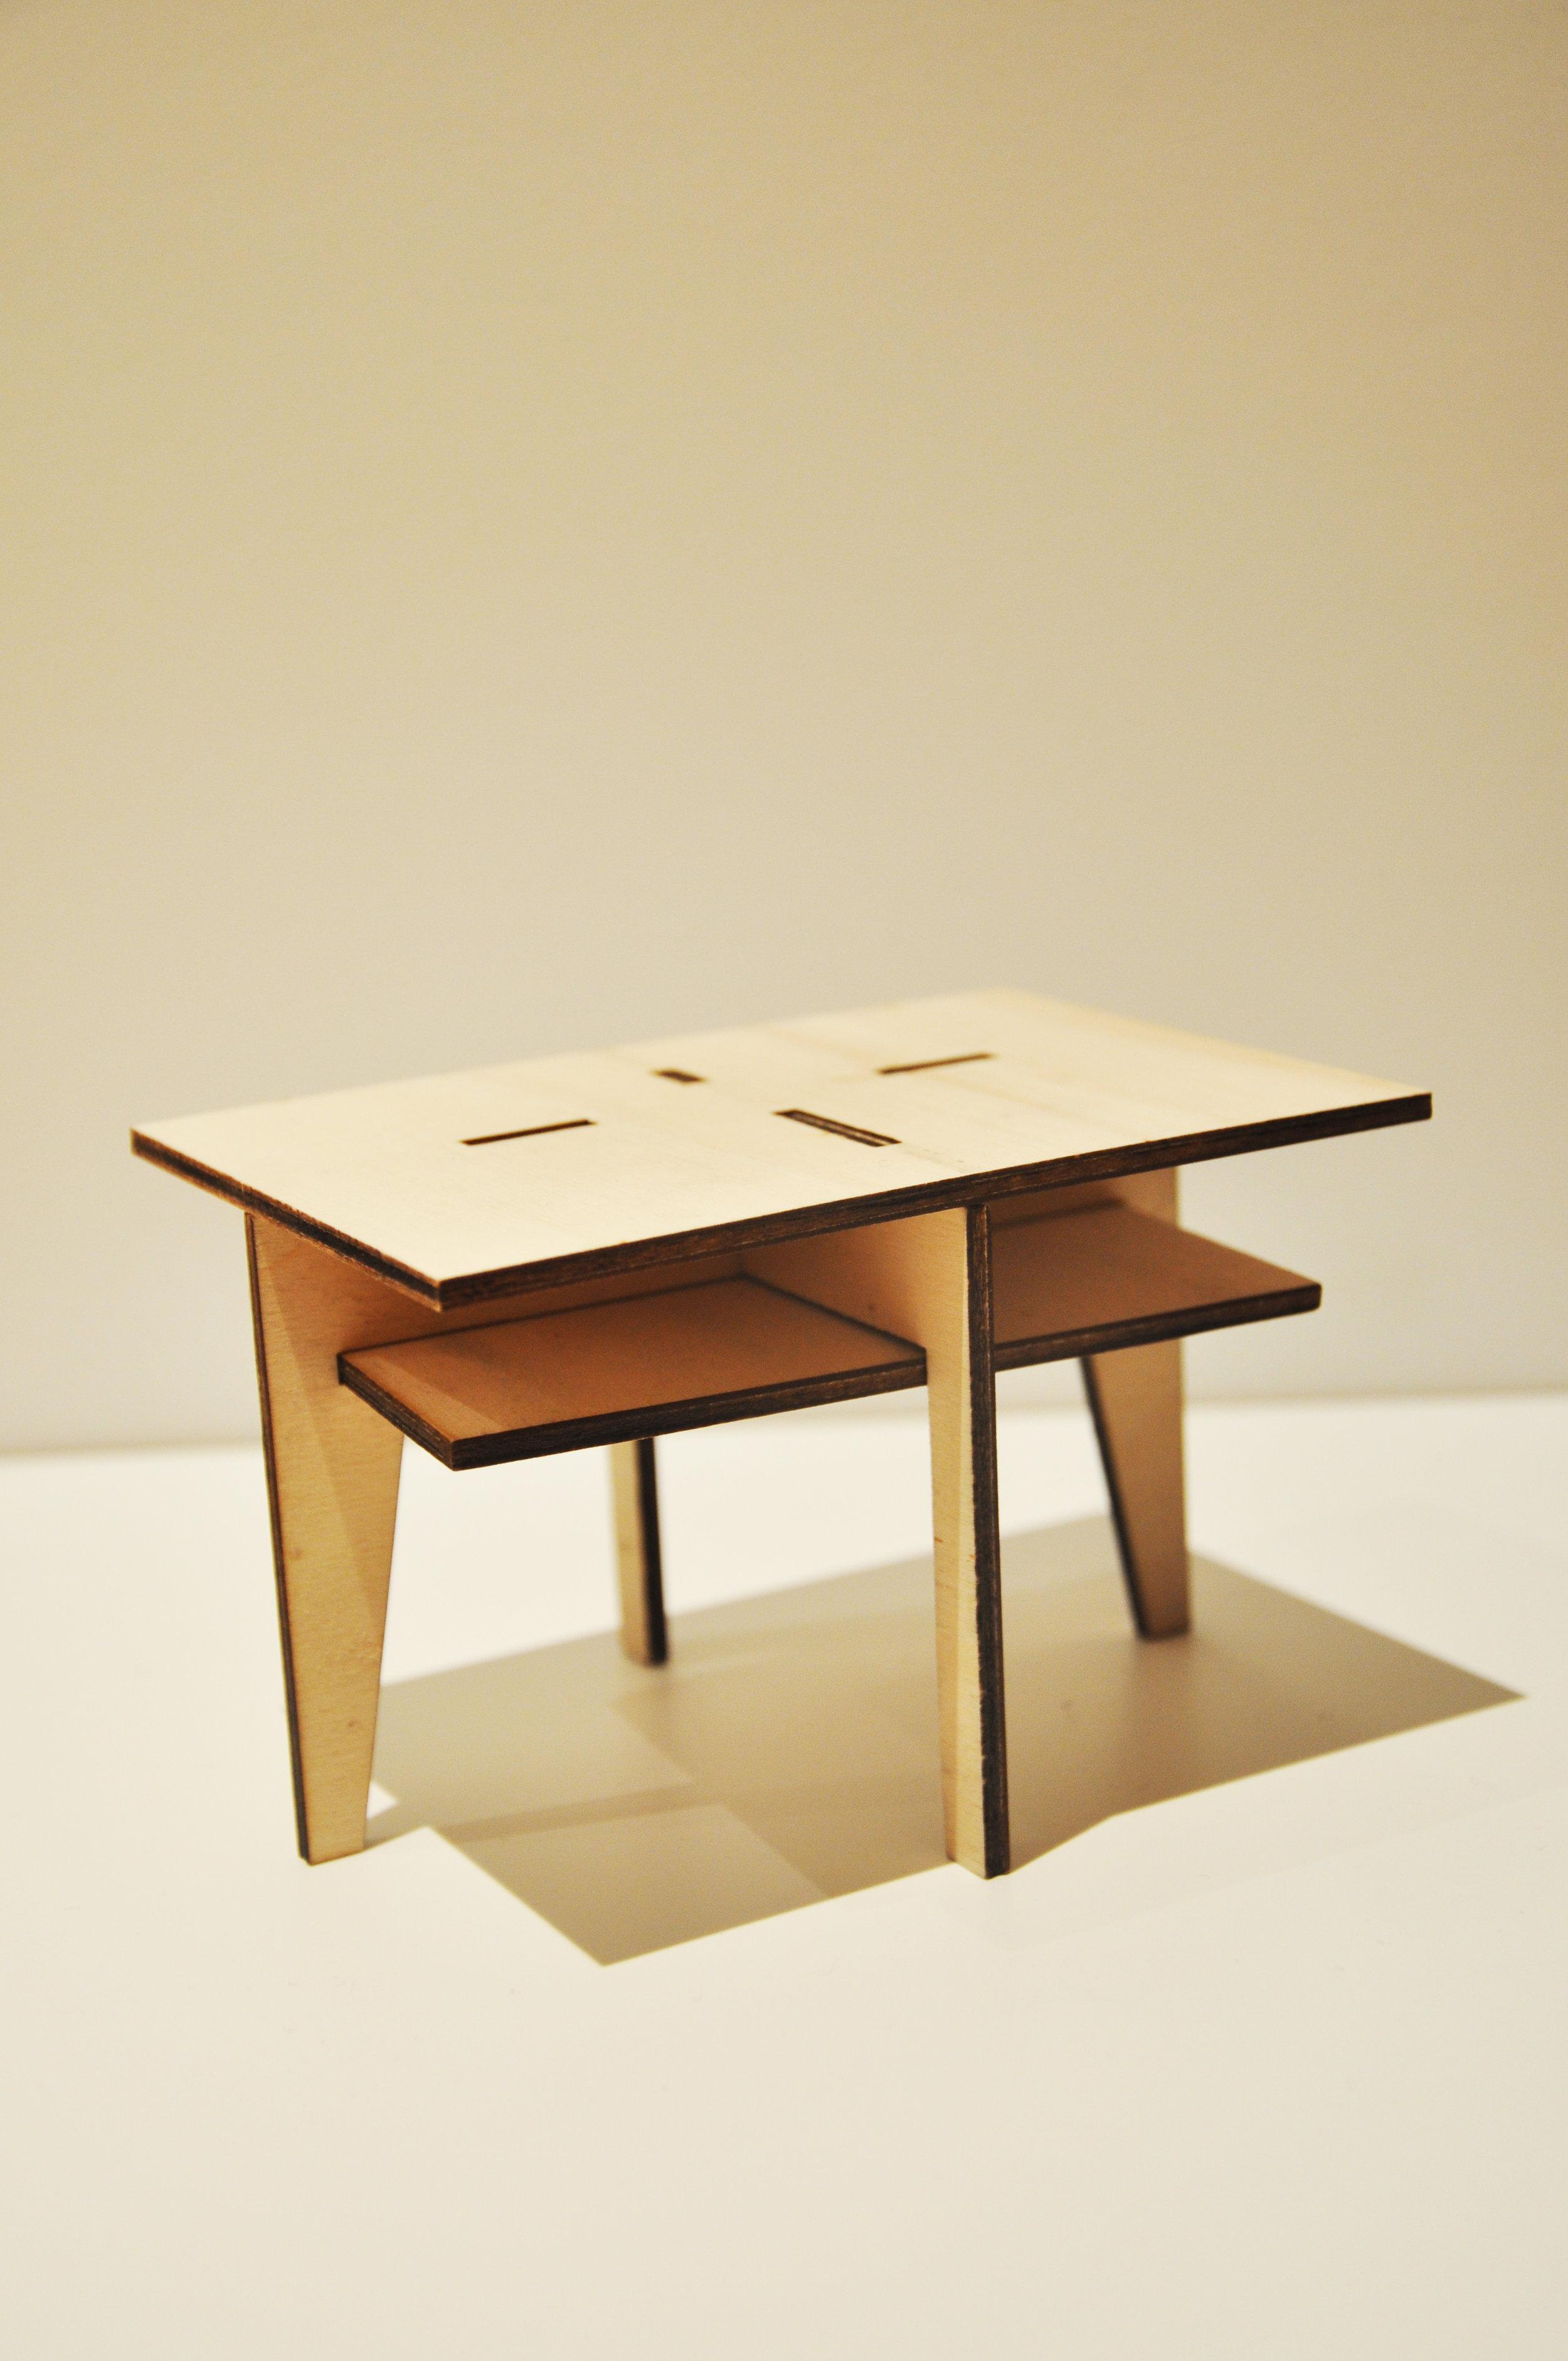 SGJDB_tafel001.jpg